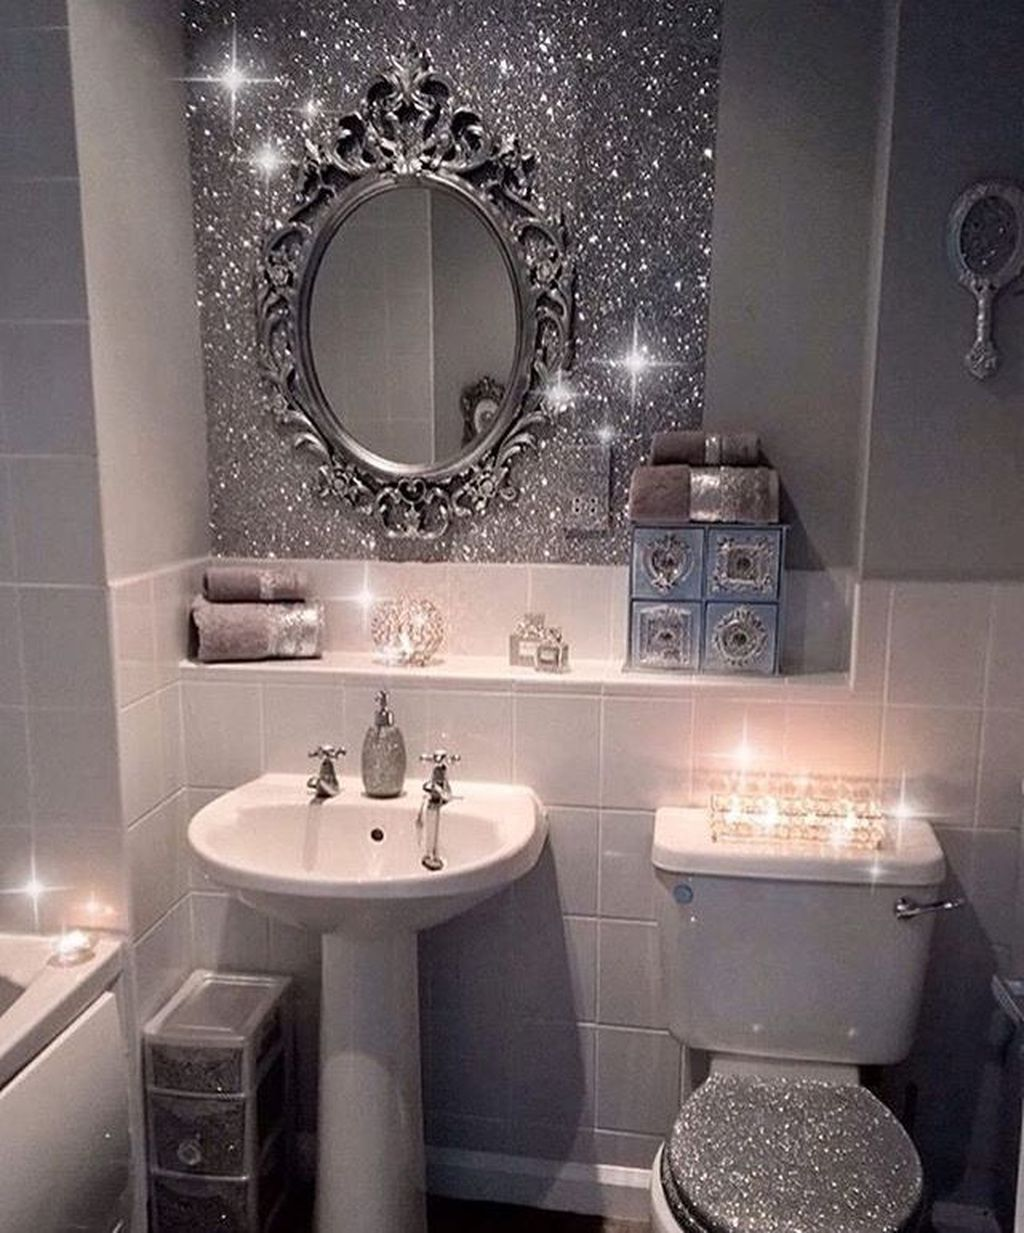 Bathroom Decor In 2020 Glamorous Bathroom Bathroom Decor